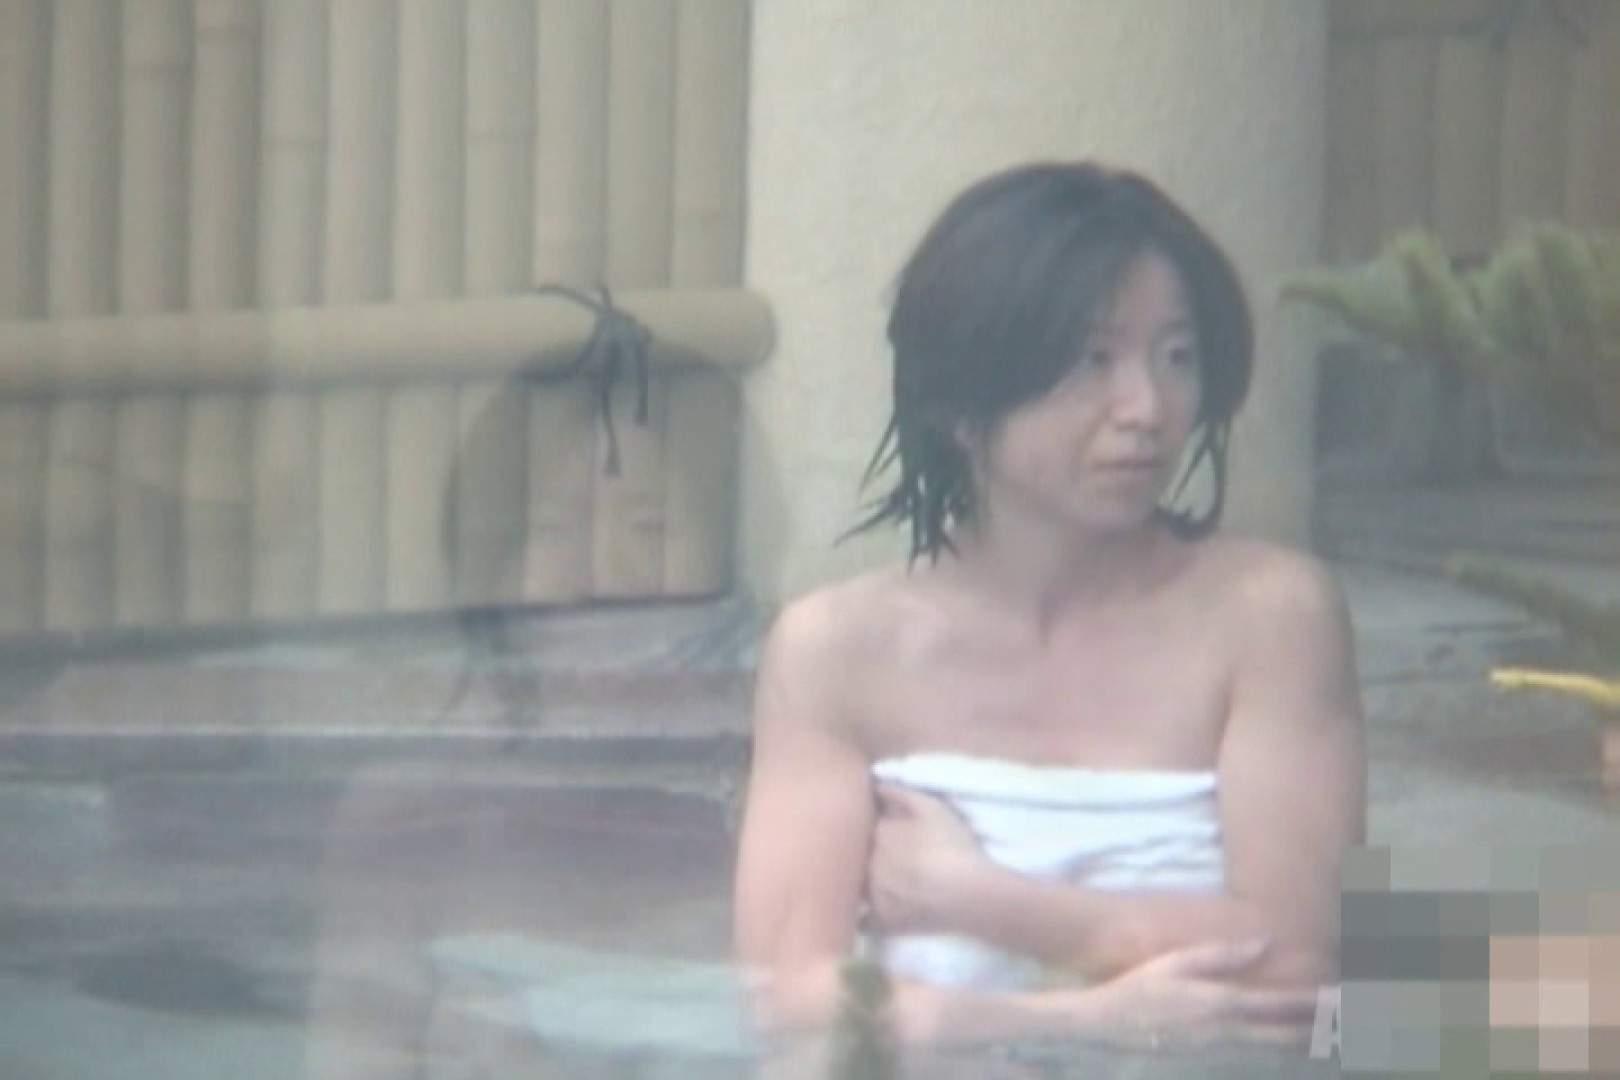 Aquaな露天風呂Vol.841 OLセックス 盗撮セックス無修正動画無料 56画像 56